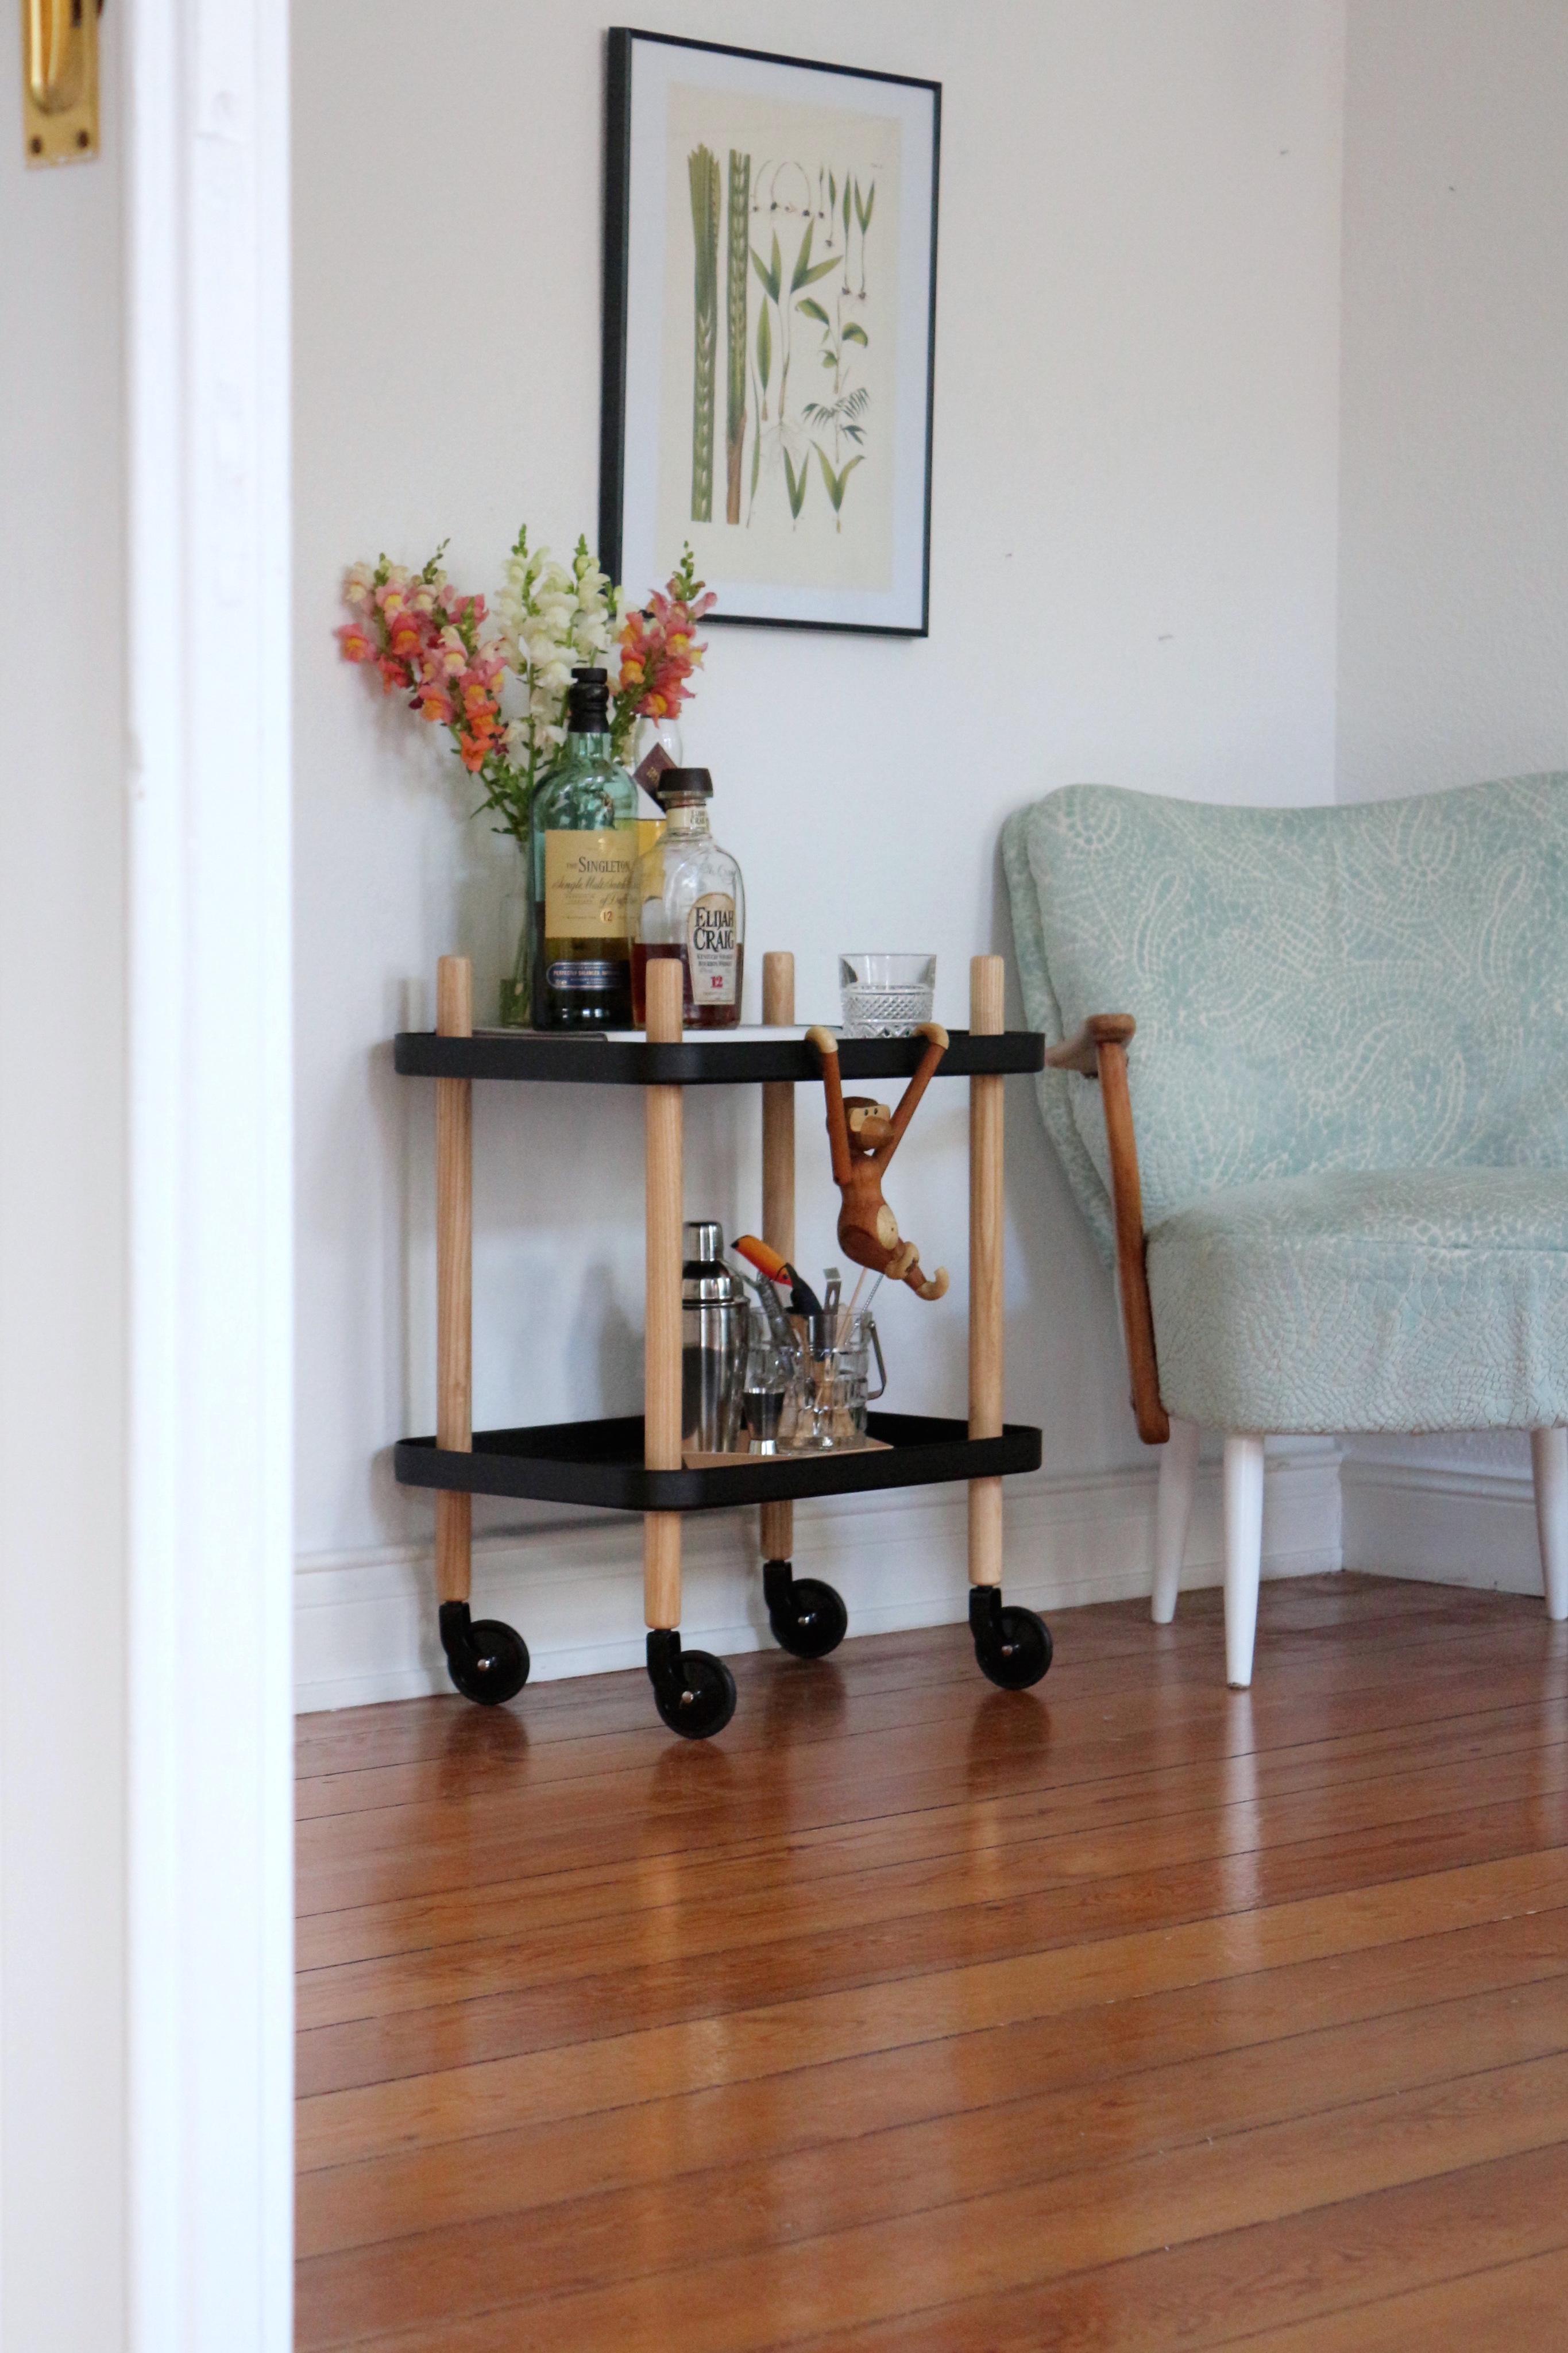 Hausbar bilder ideen couchstyle - Hausbar ideen ...